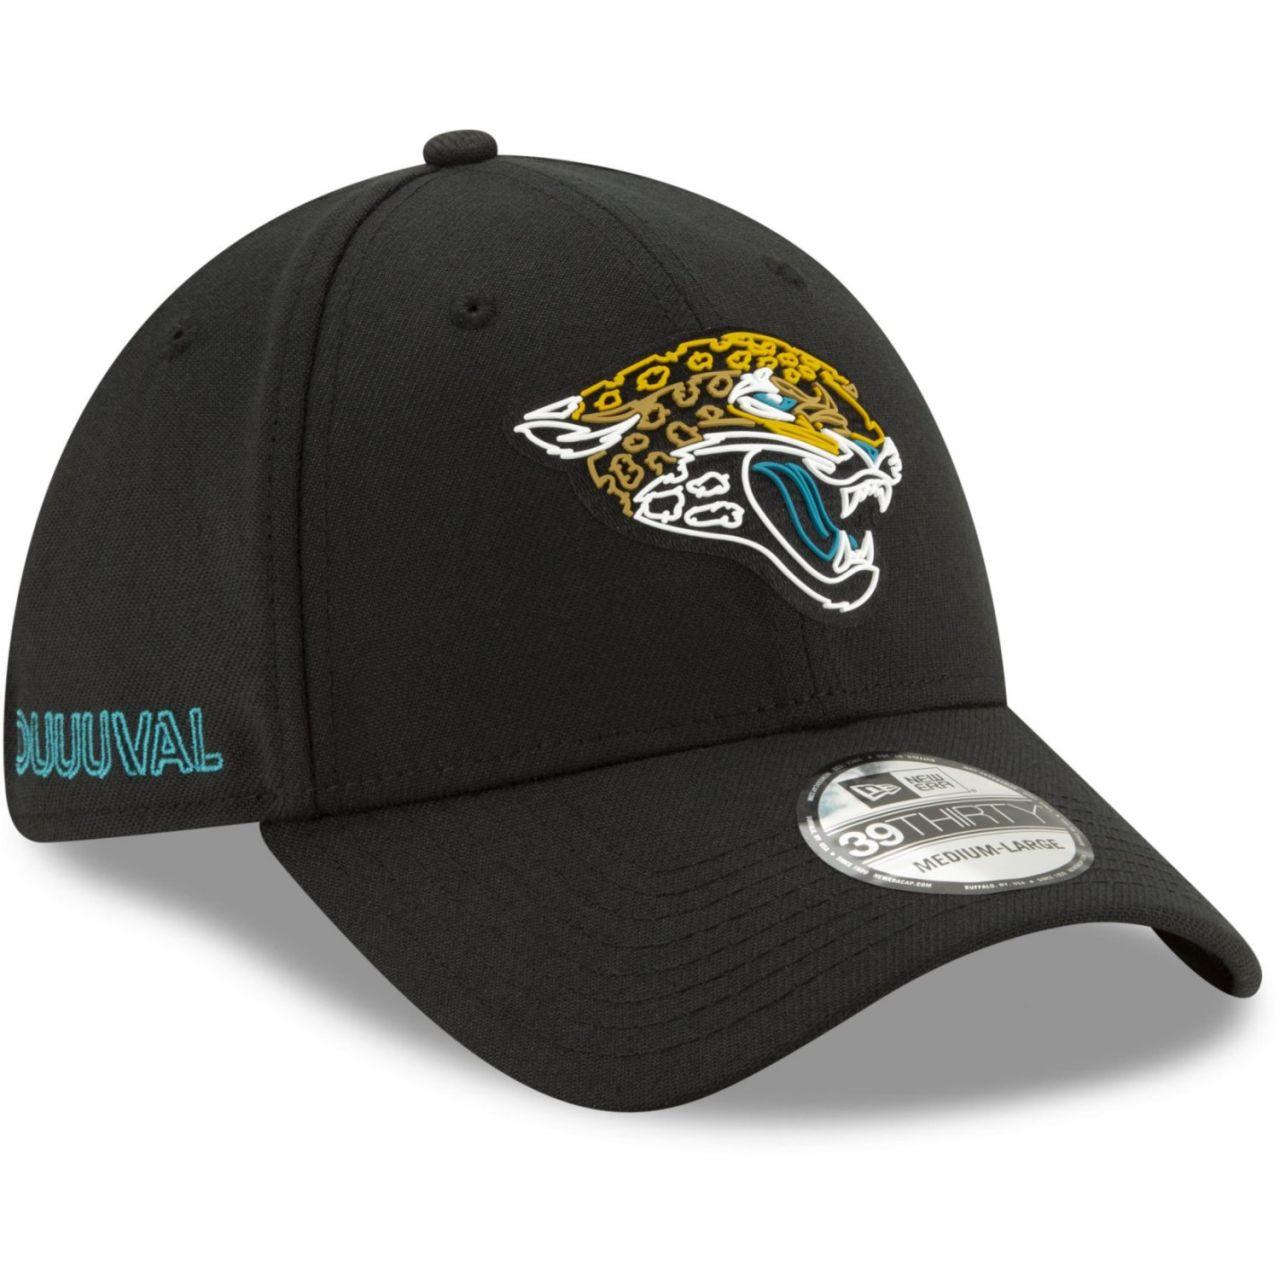 amfoo - New Era 39Thirty Cap - NFL 2020 DRAFT Jacksonville Jaguars